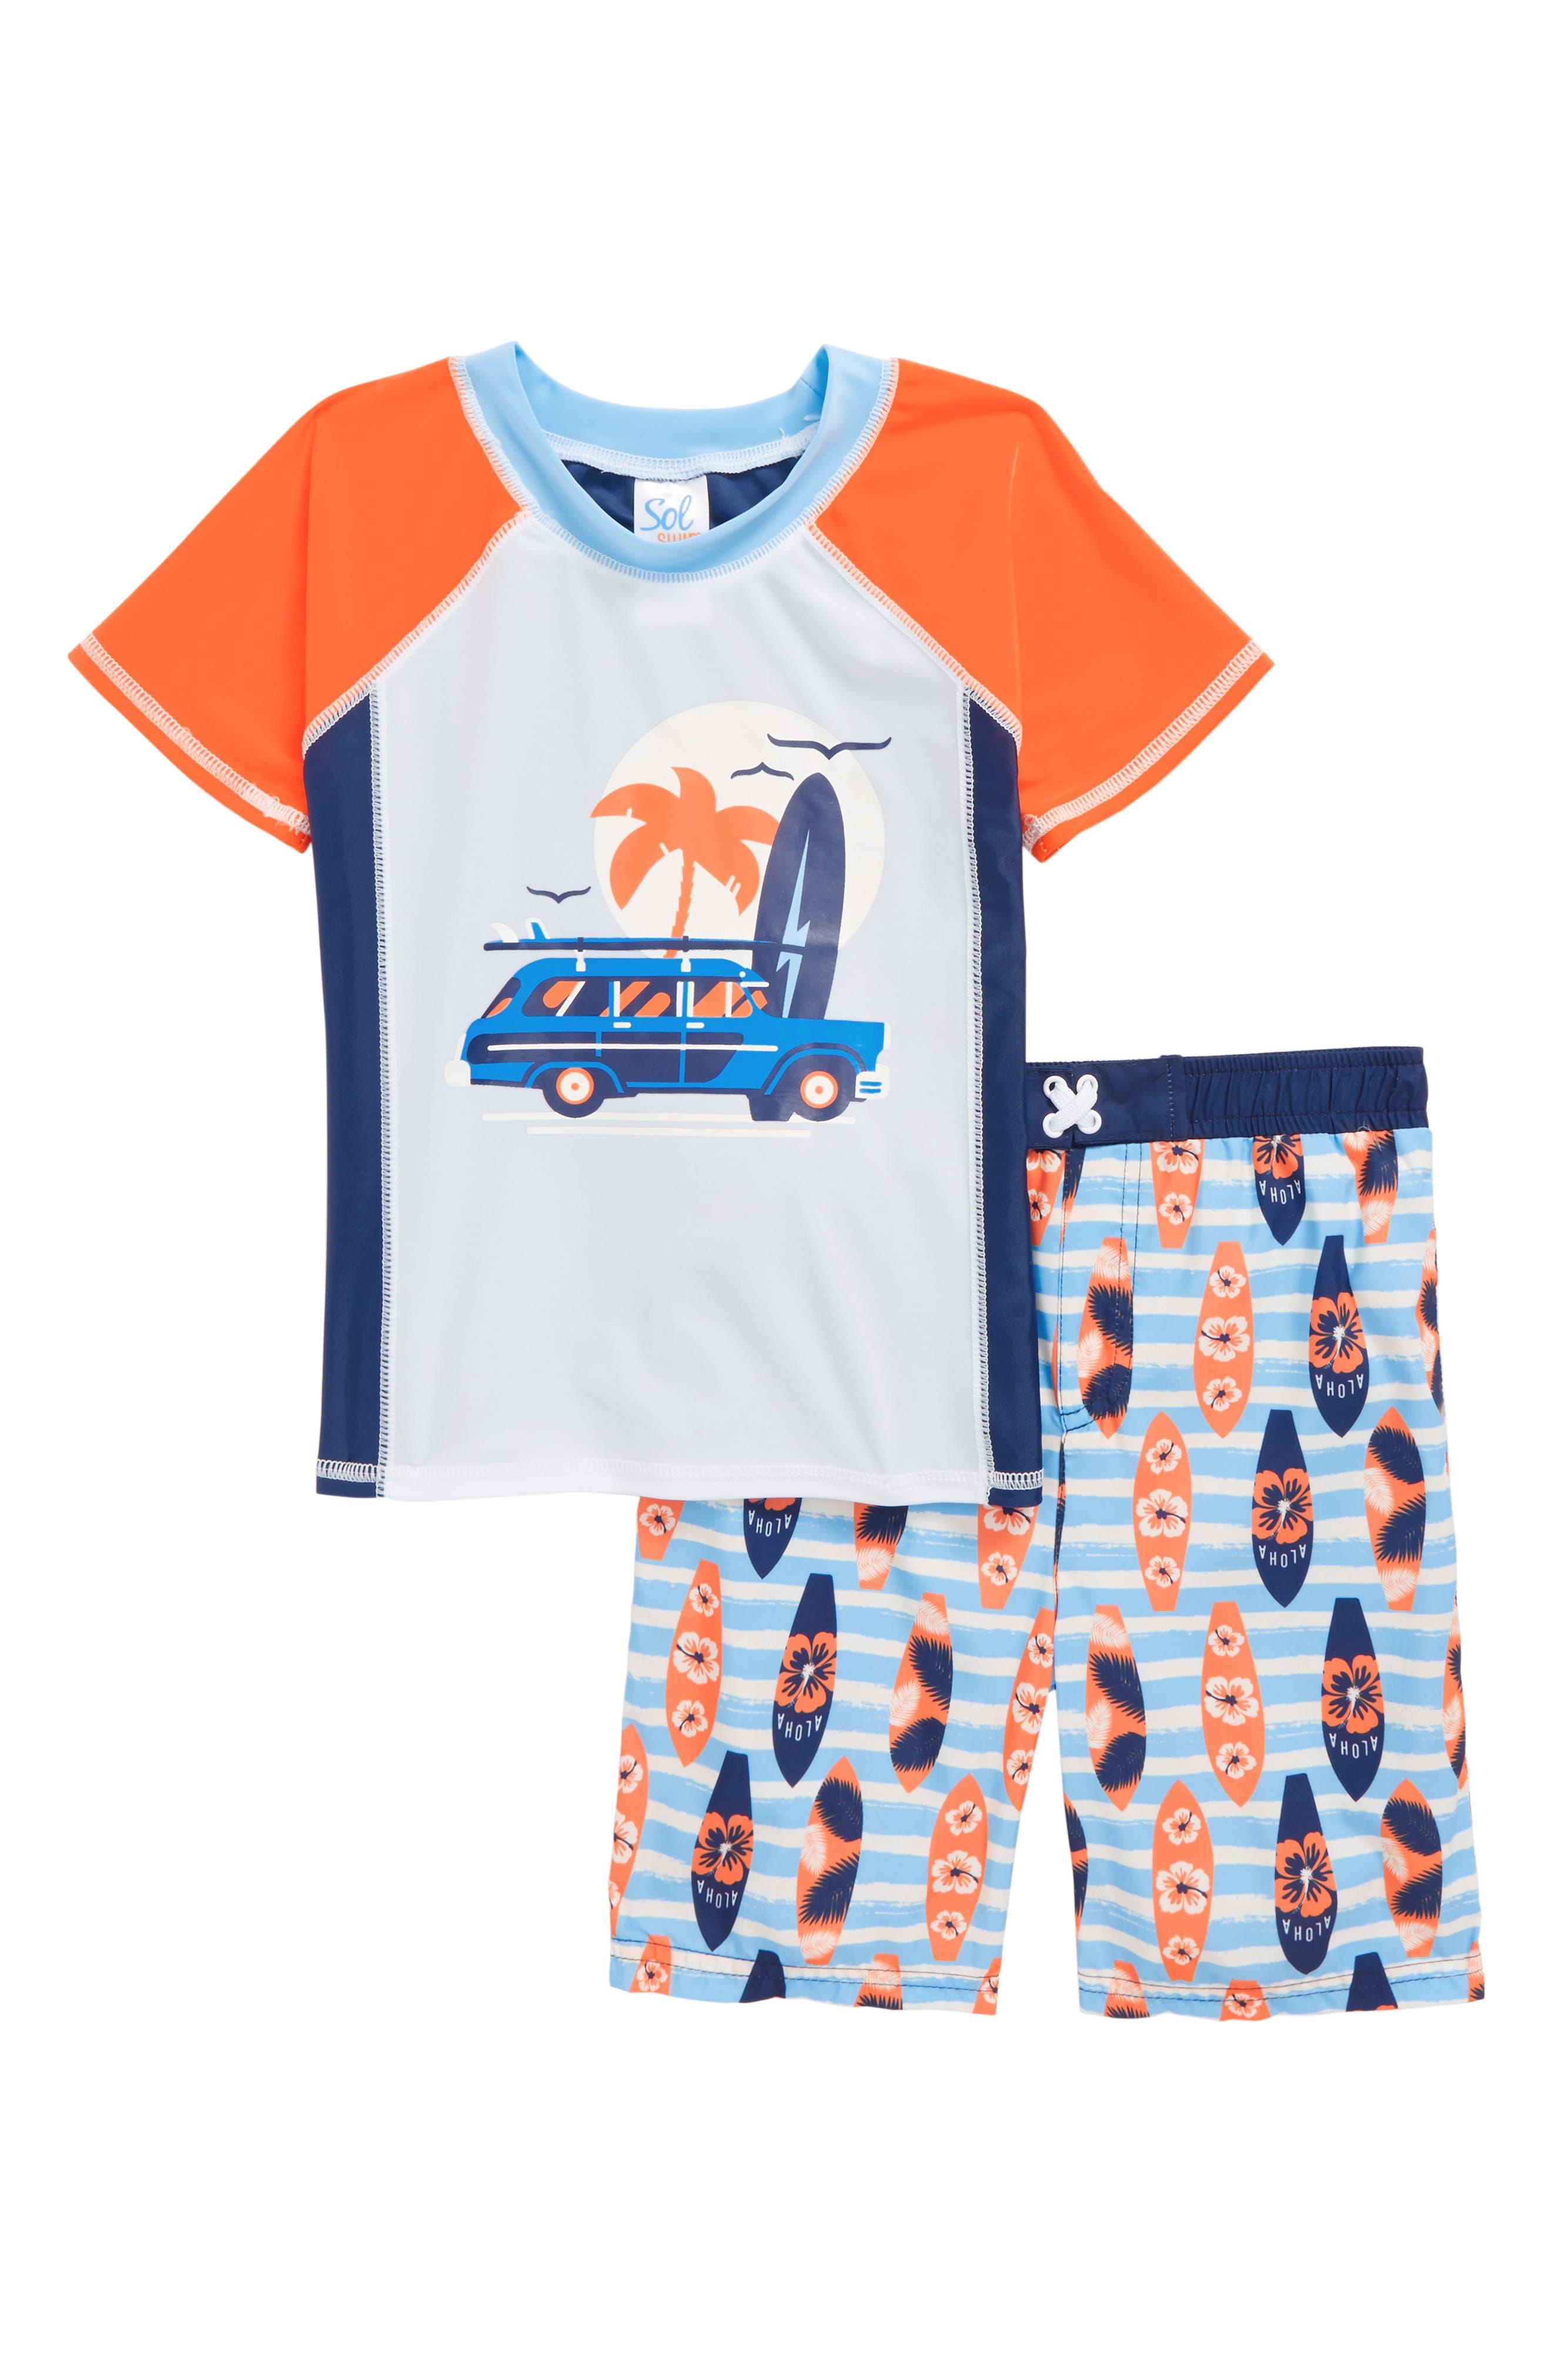 Sol Swim Surf Shop Two-Piece Rashguard Swimsuit (Toddler Boys & Little Boys)